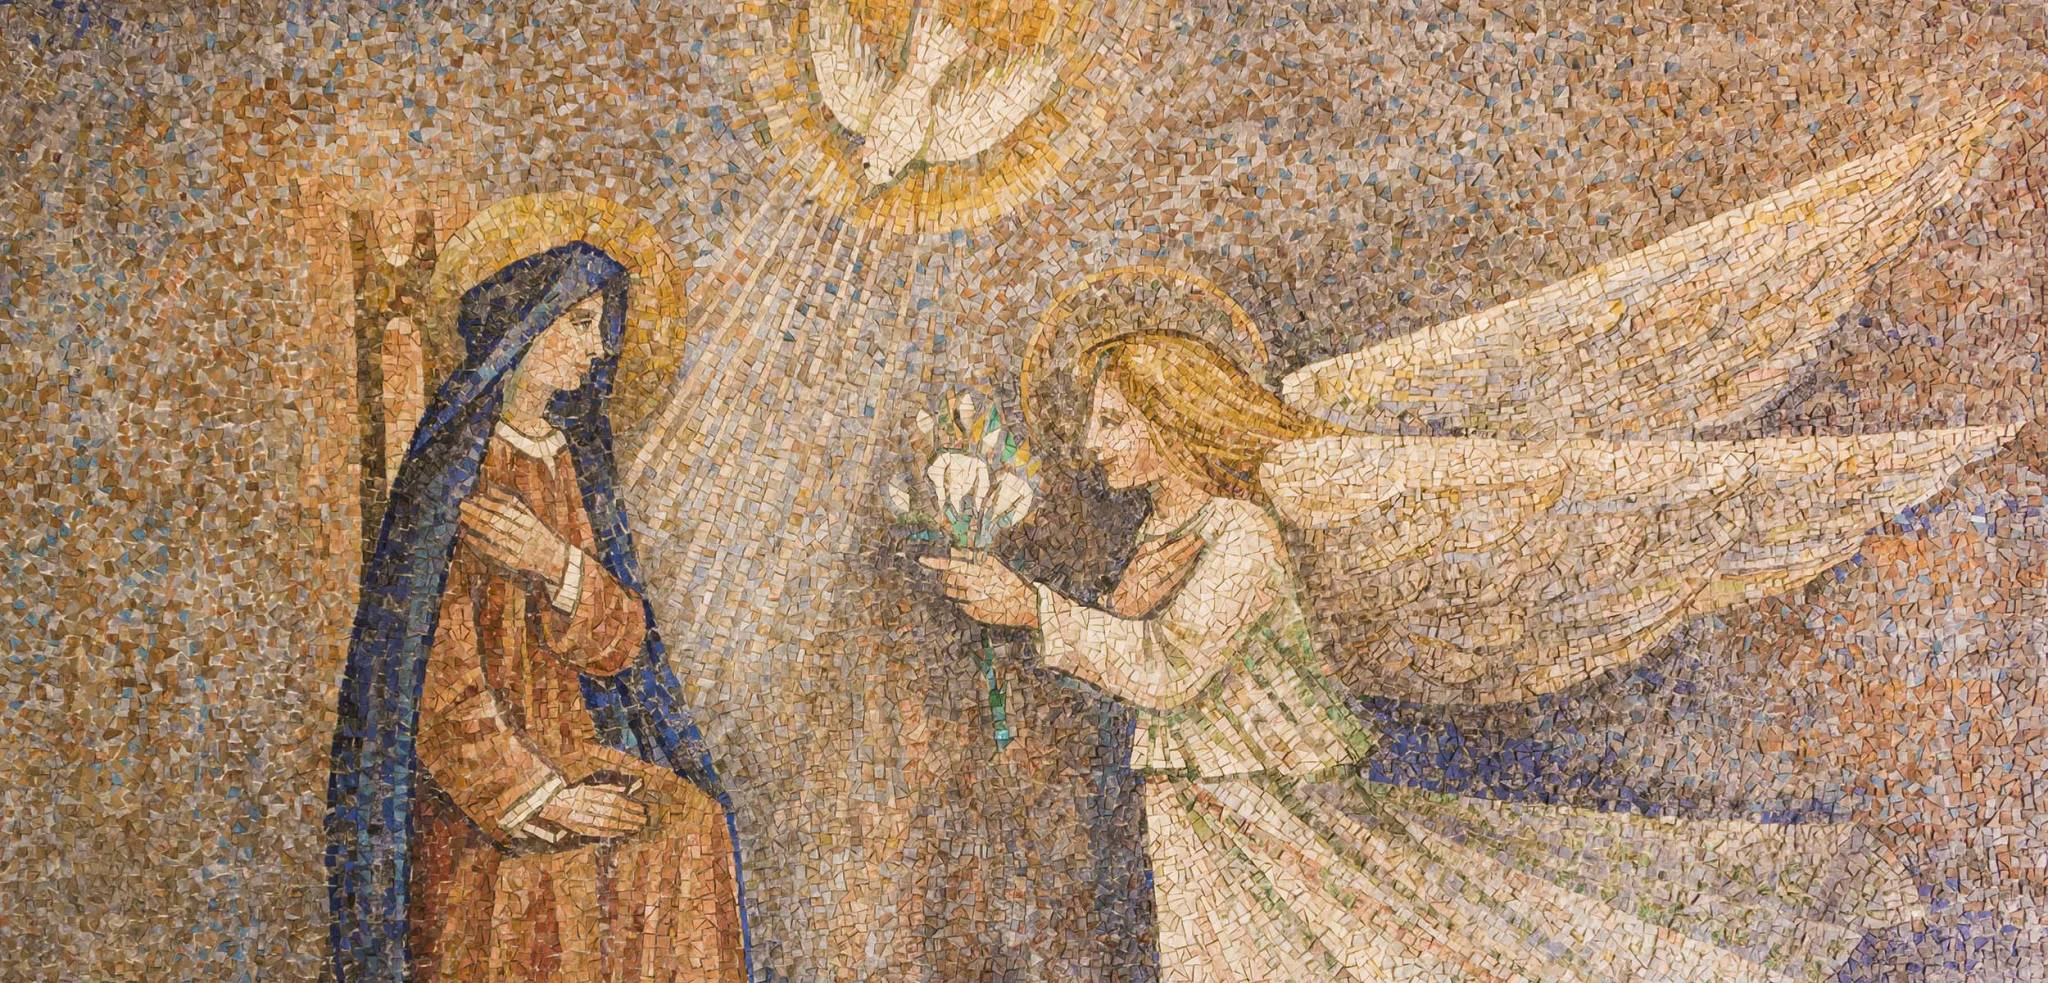 God's postman, teacher of the prophets: the angel Gabriel in